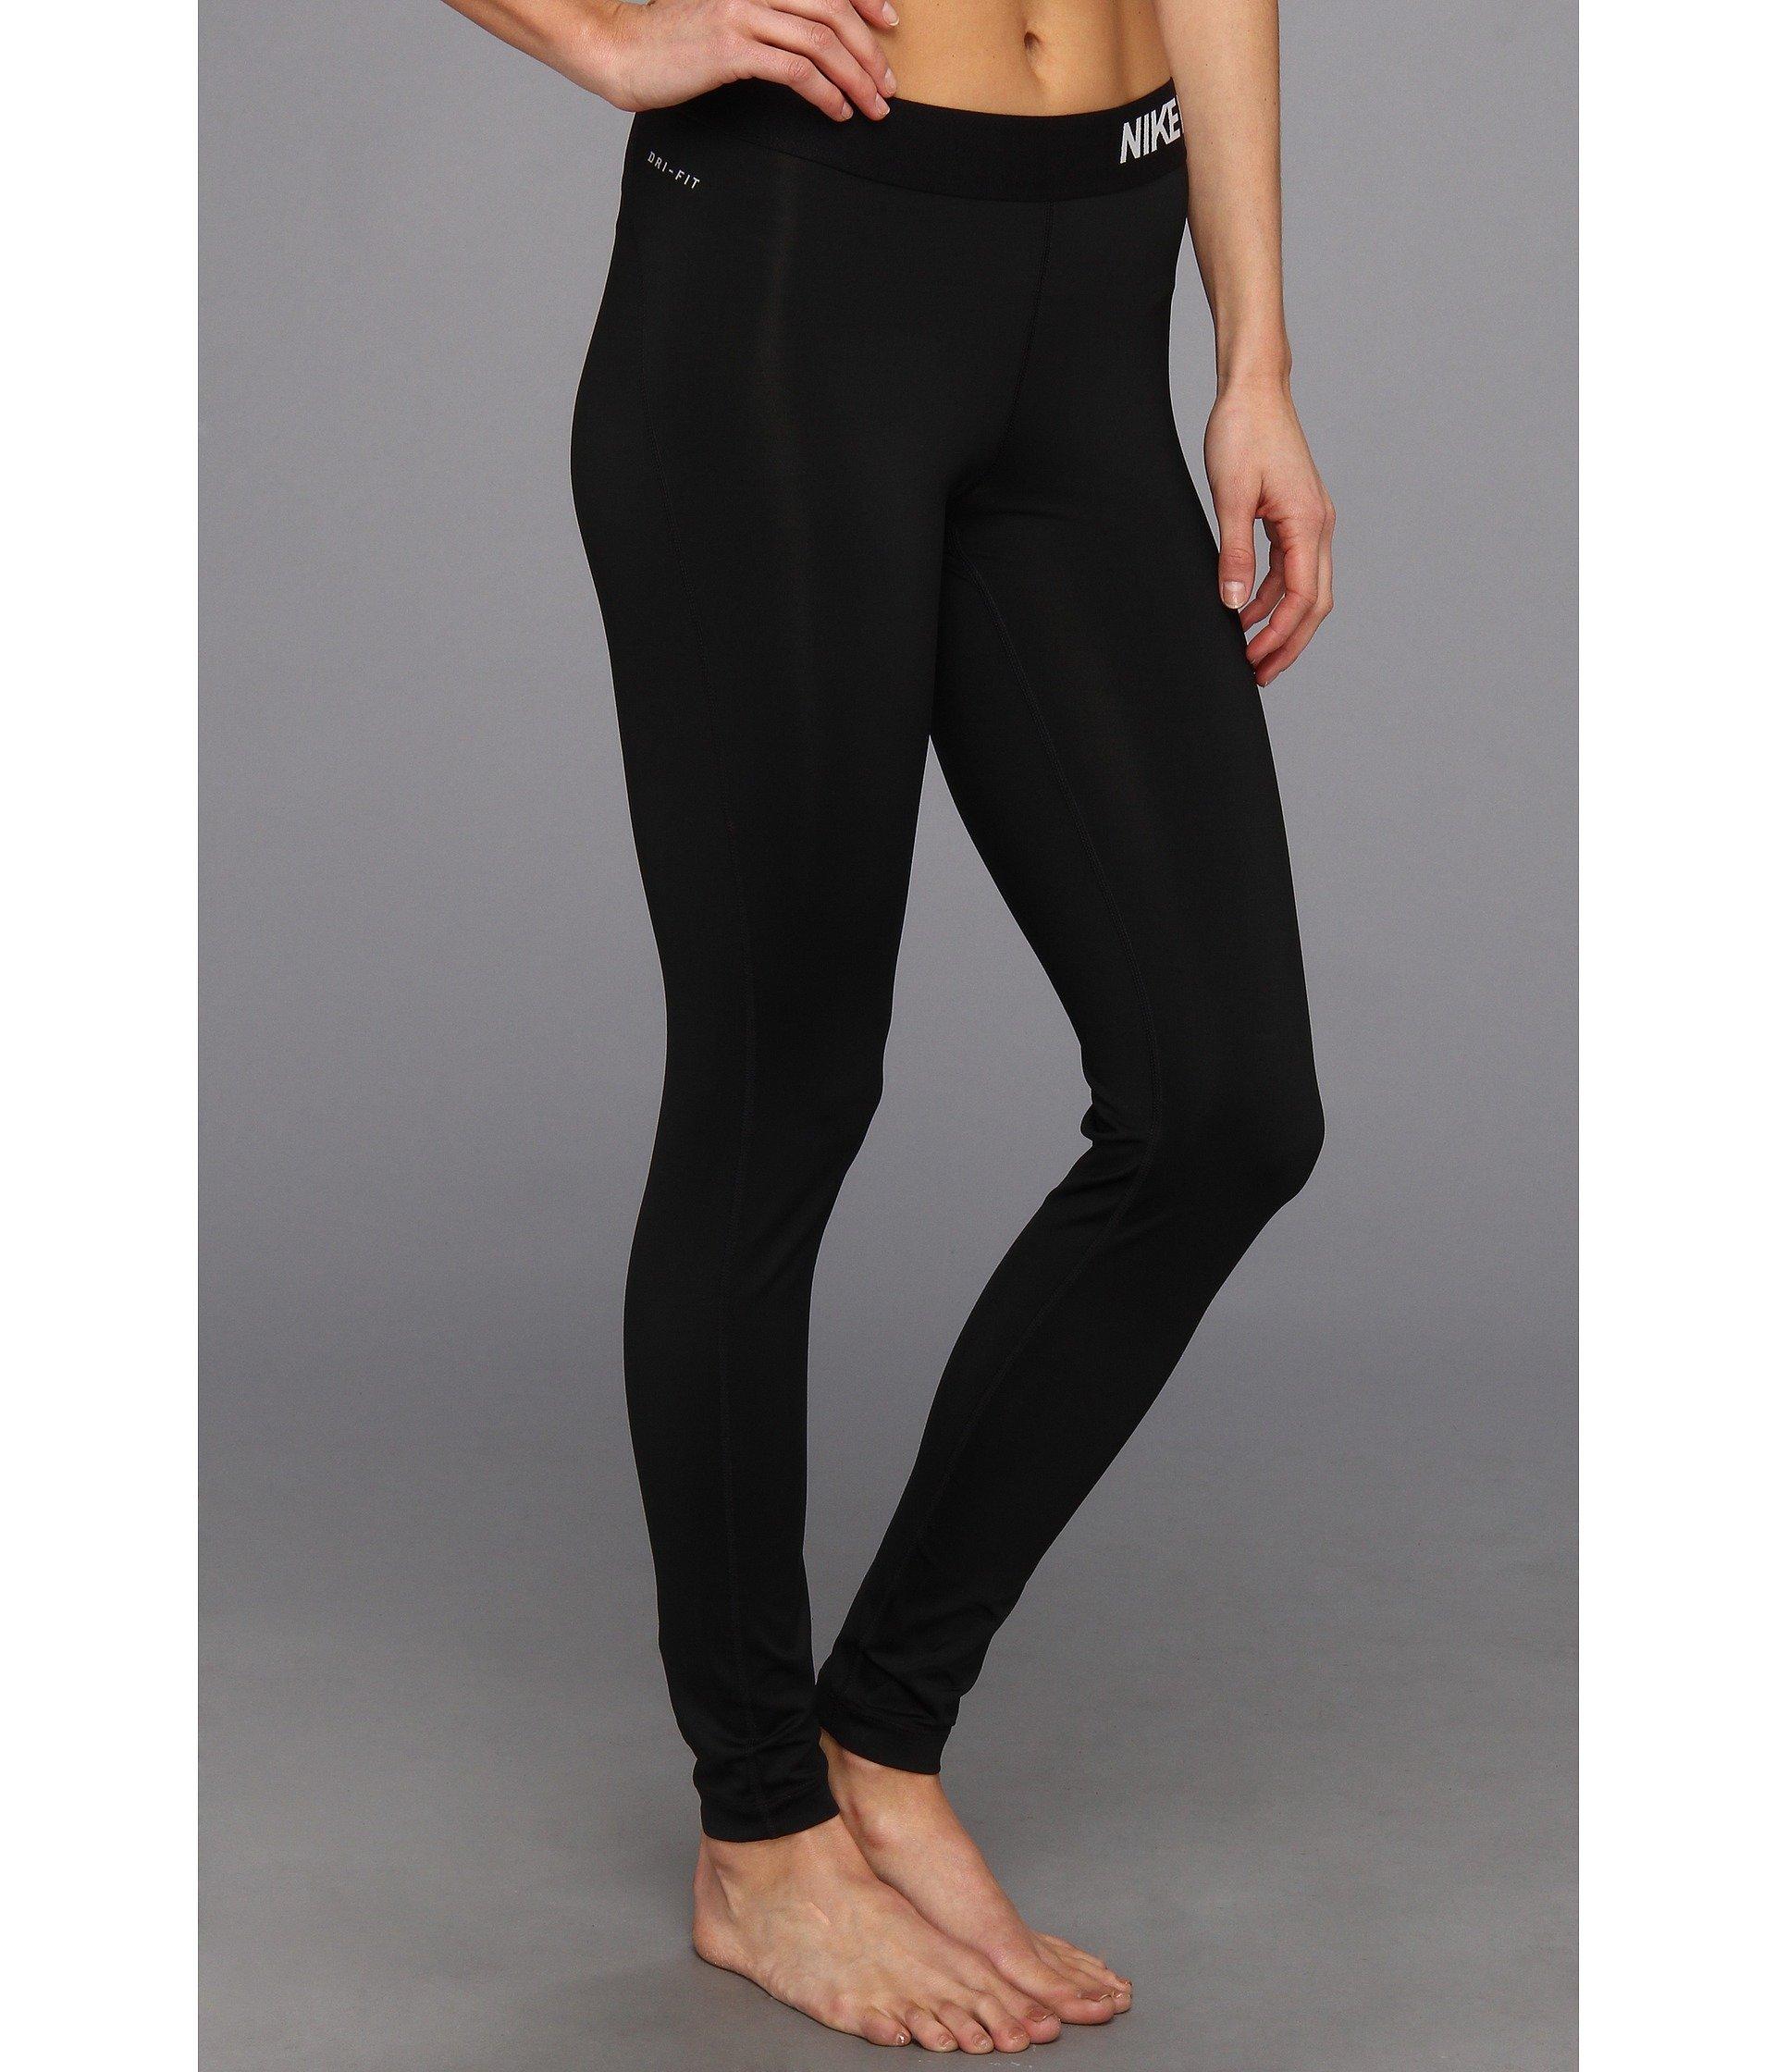 Nike Women's PRO Dri-FIT Training Competition Tights-Pants; Black, [M] Medium by Nike